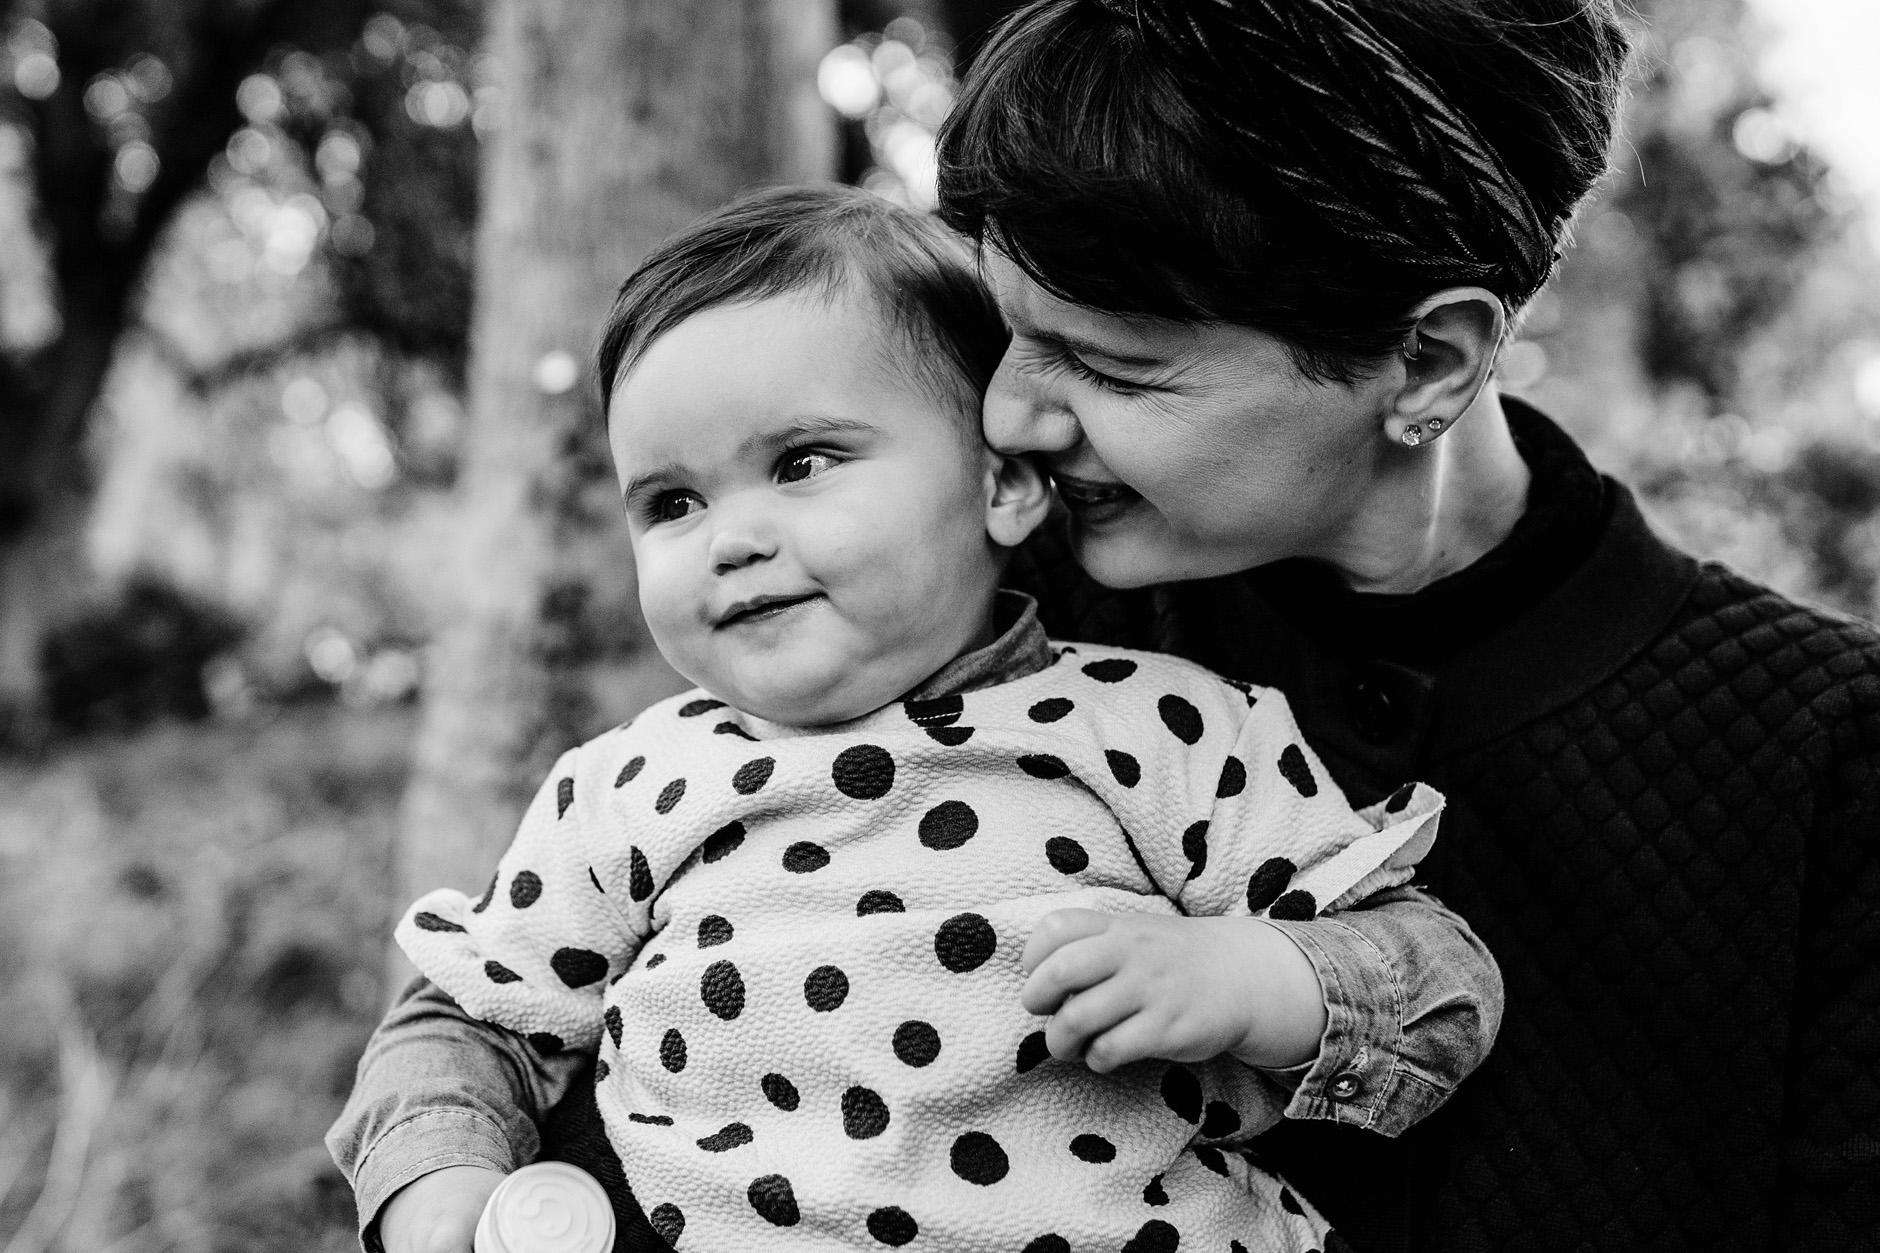 candid-natural-children-family-photographer-dublin-0008.jpg